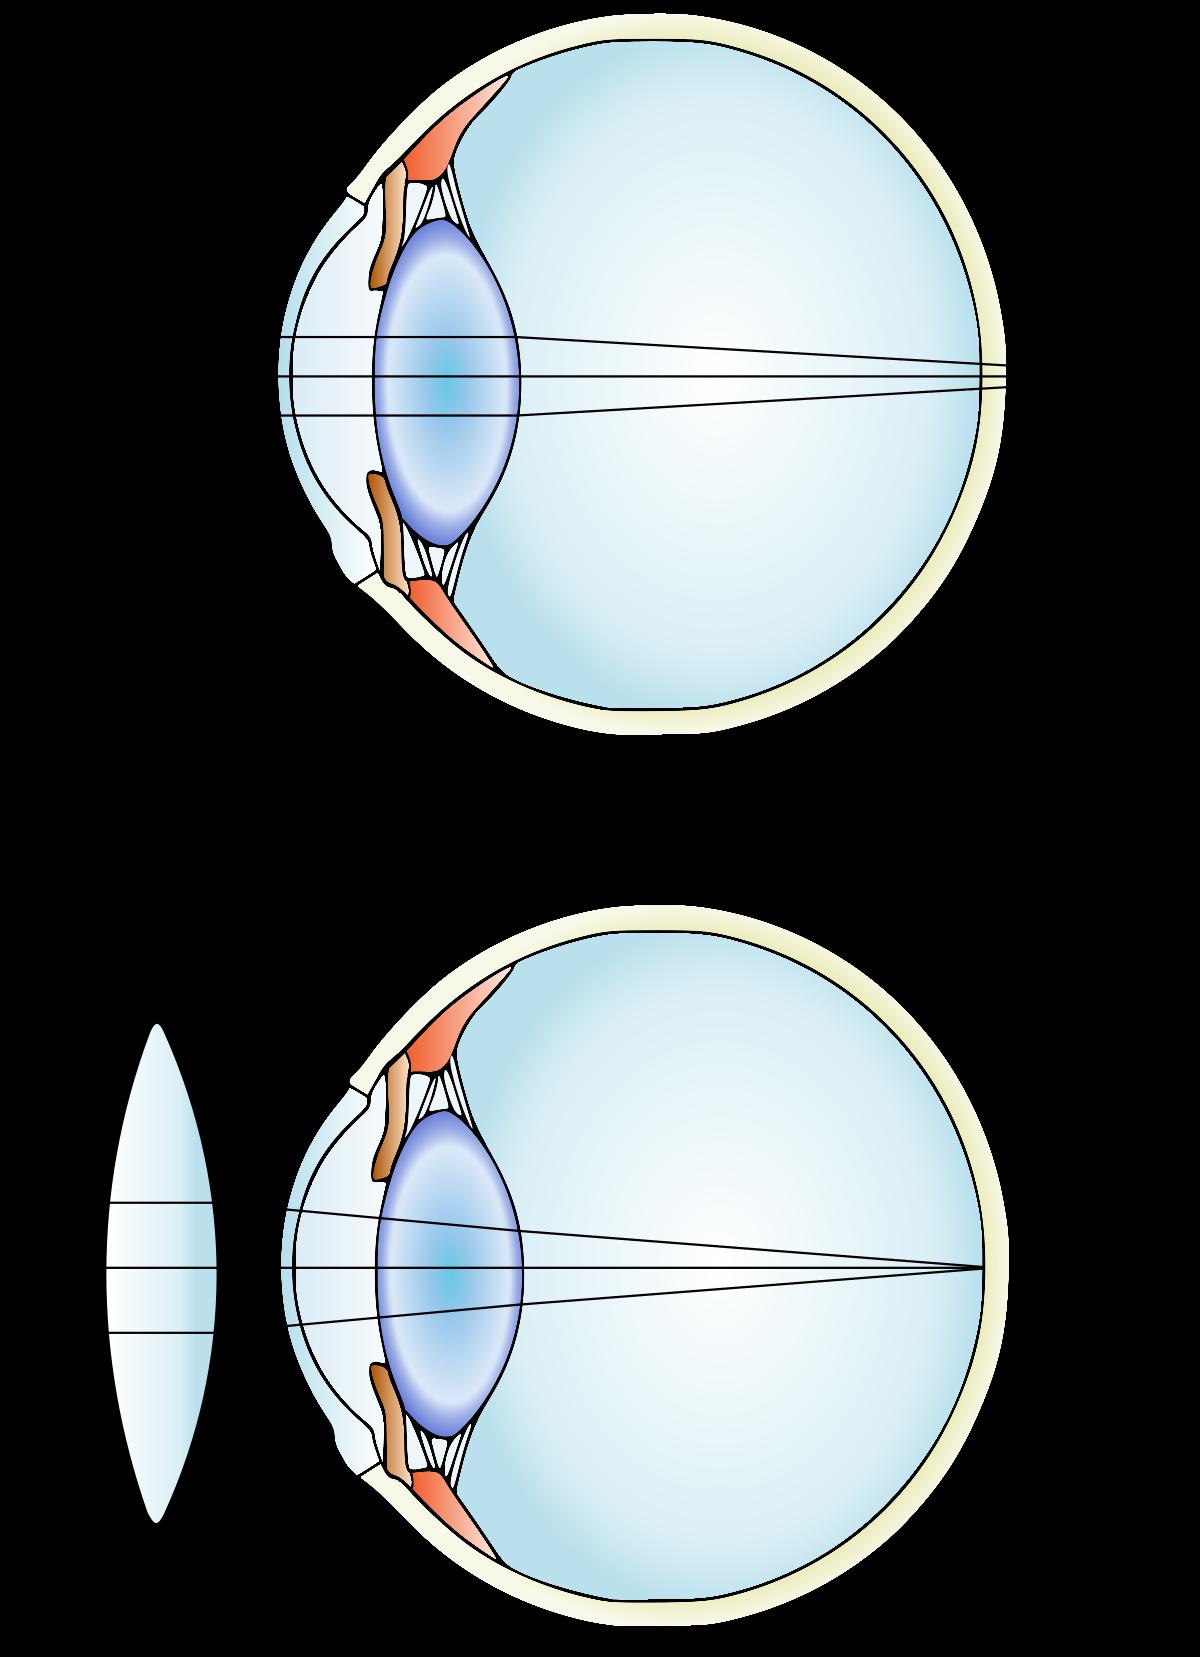 Hyperopia myopia vision. rövidlátás